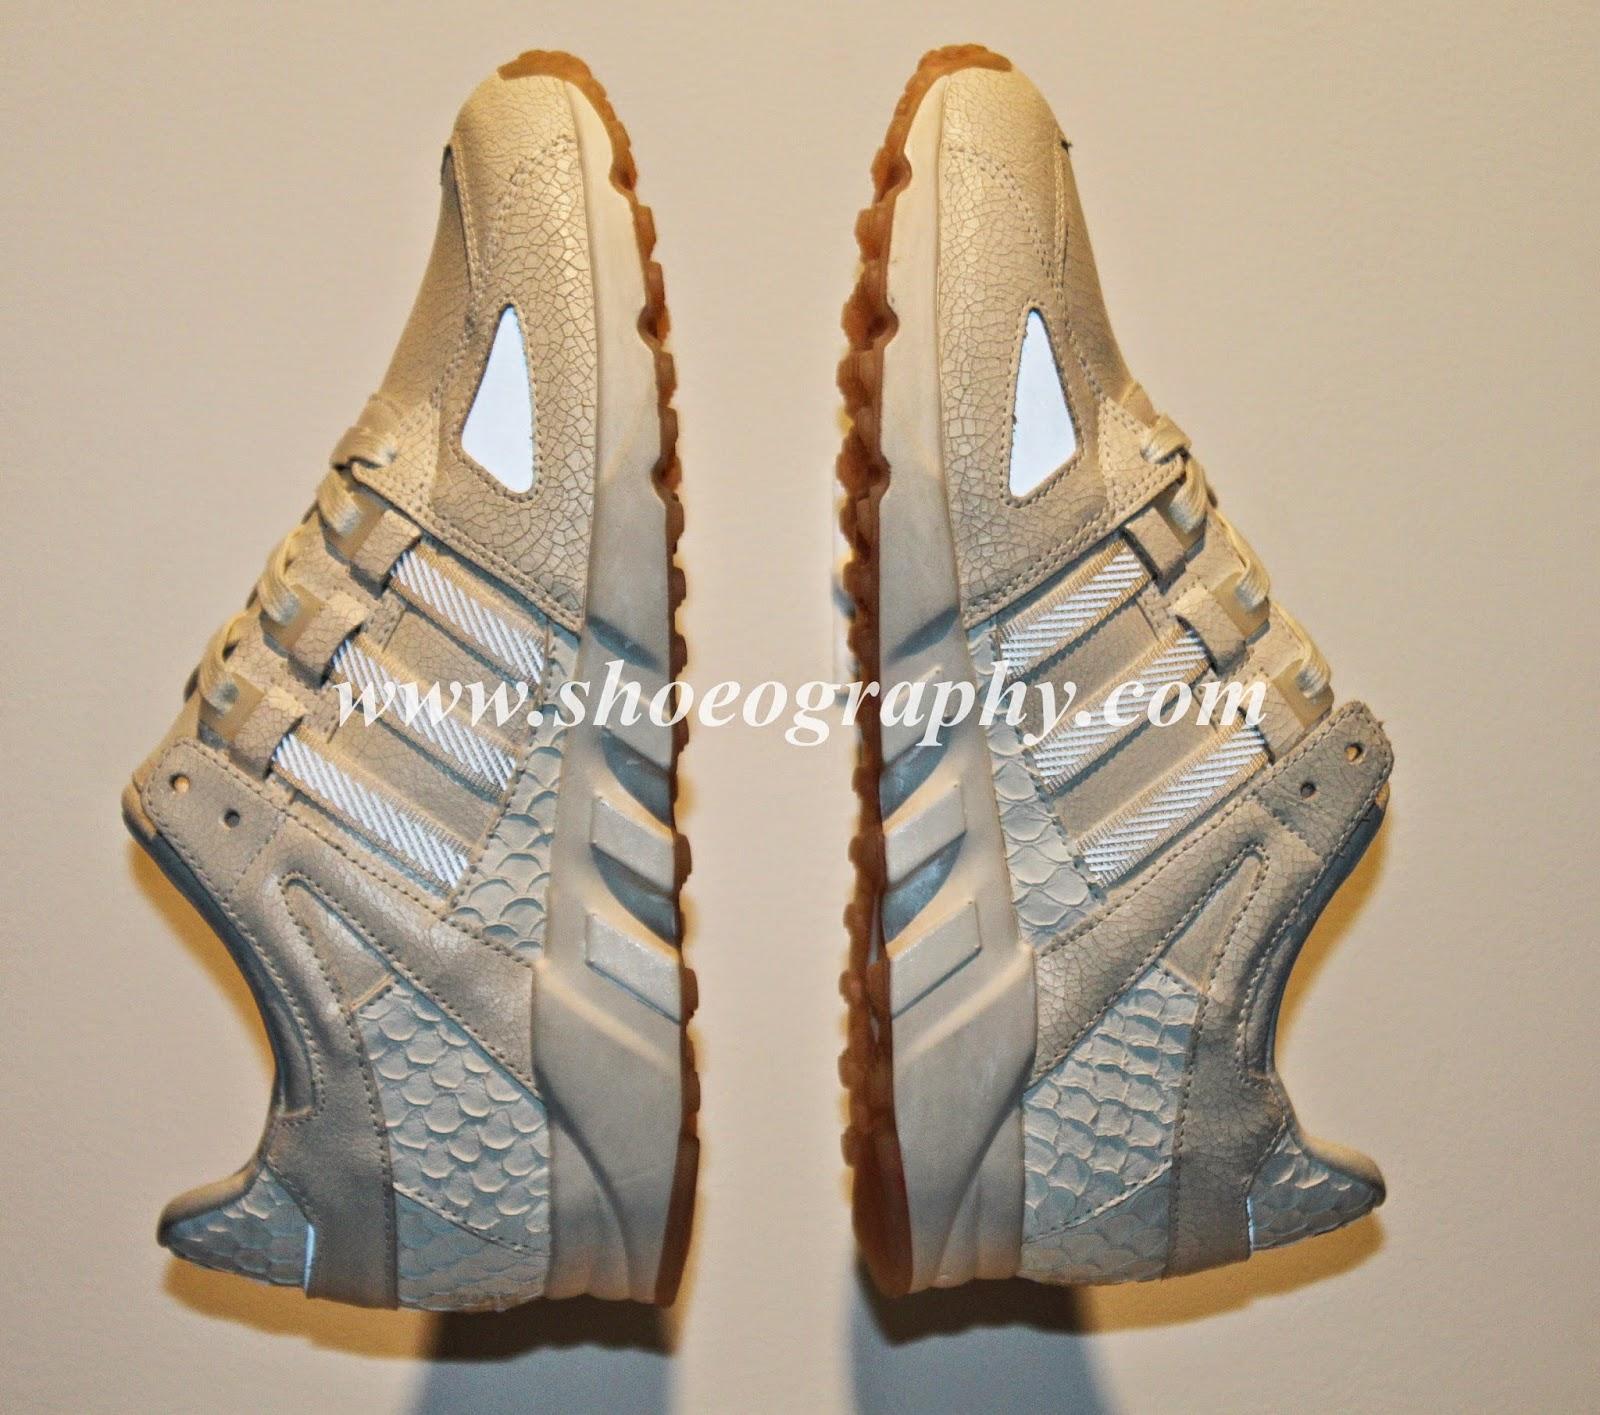 b901afcbc212 Kix Spotlight  Adidas EQT Guidance 93  King Push  Sneaker